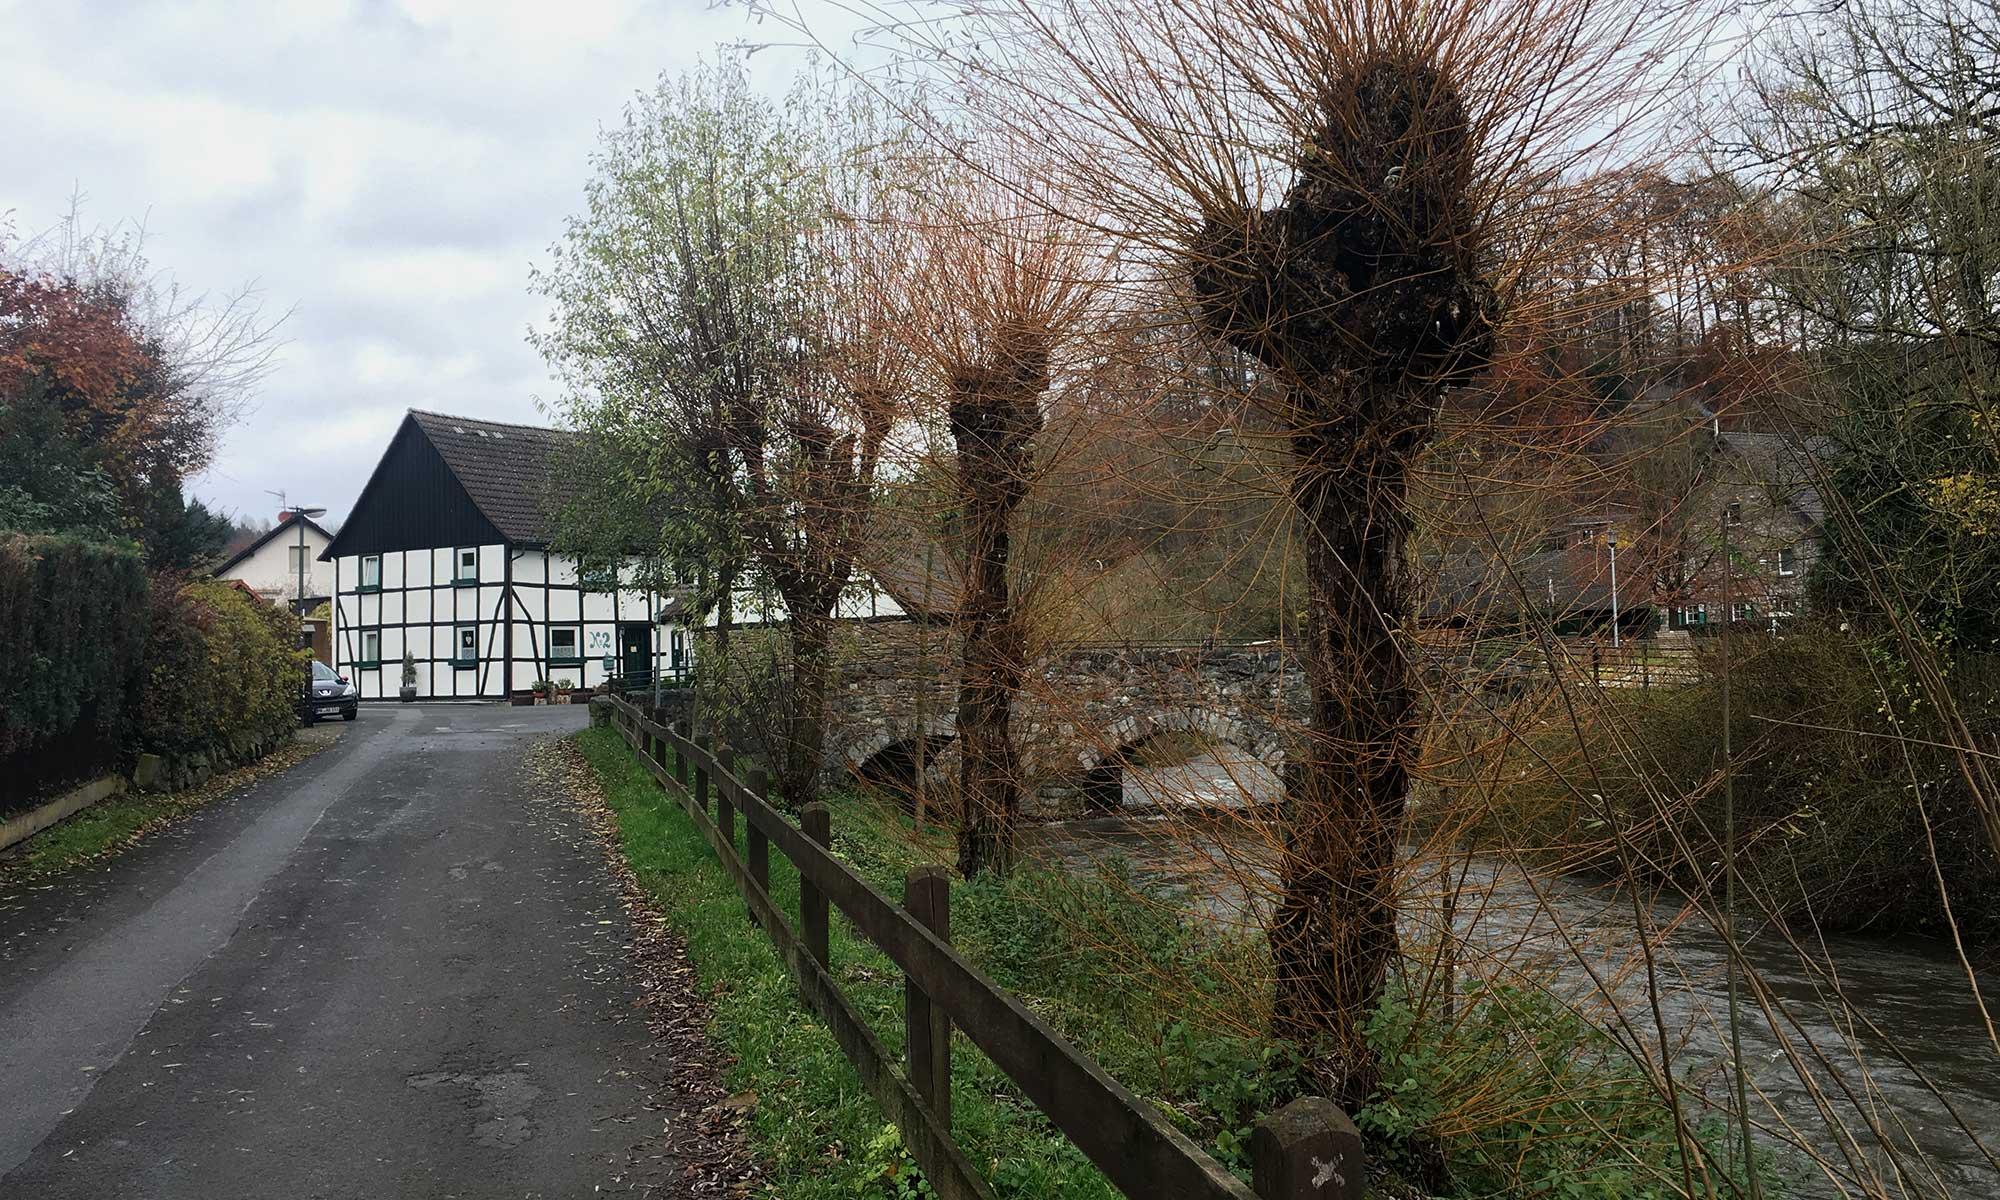 Alte Brücke über die Hönne in Volkringhausen